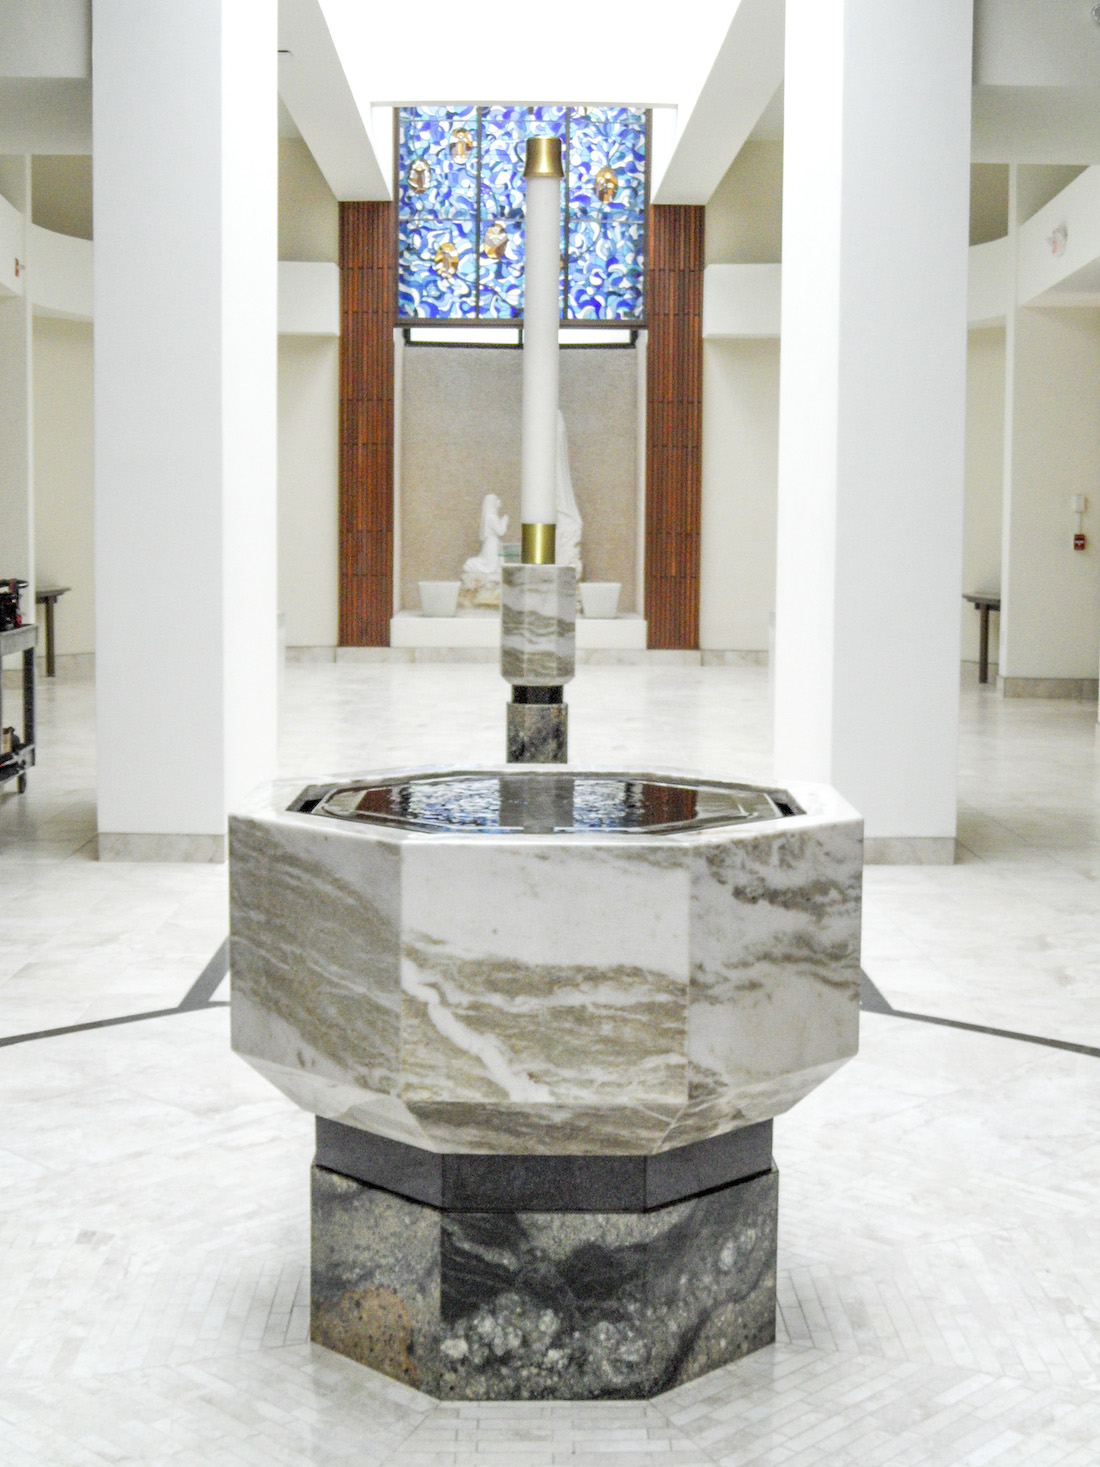 Negative Edge Baptismal Font, Our Lady of Lourdes, Dunedin, FL